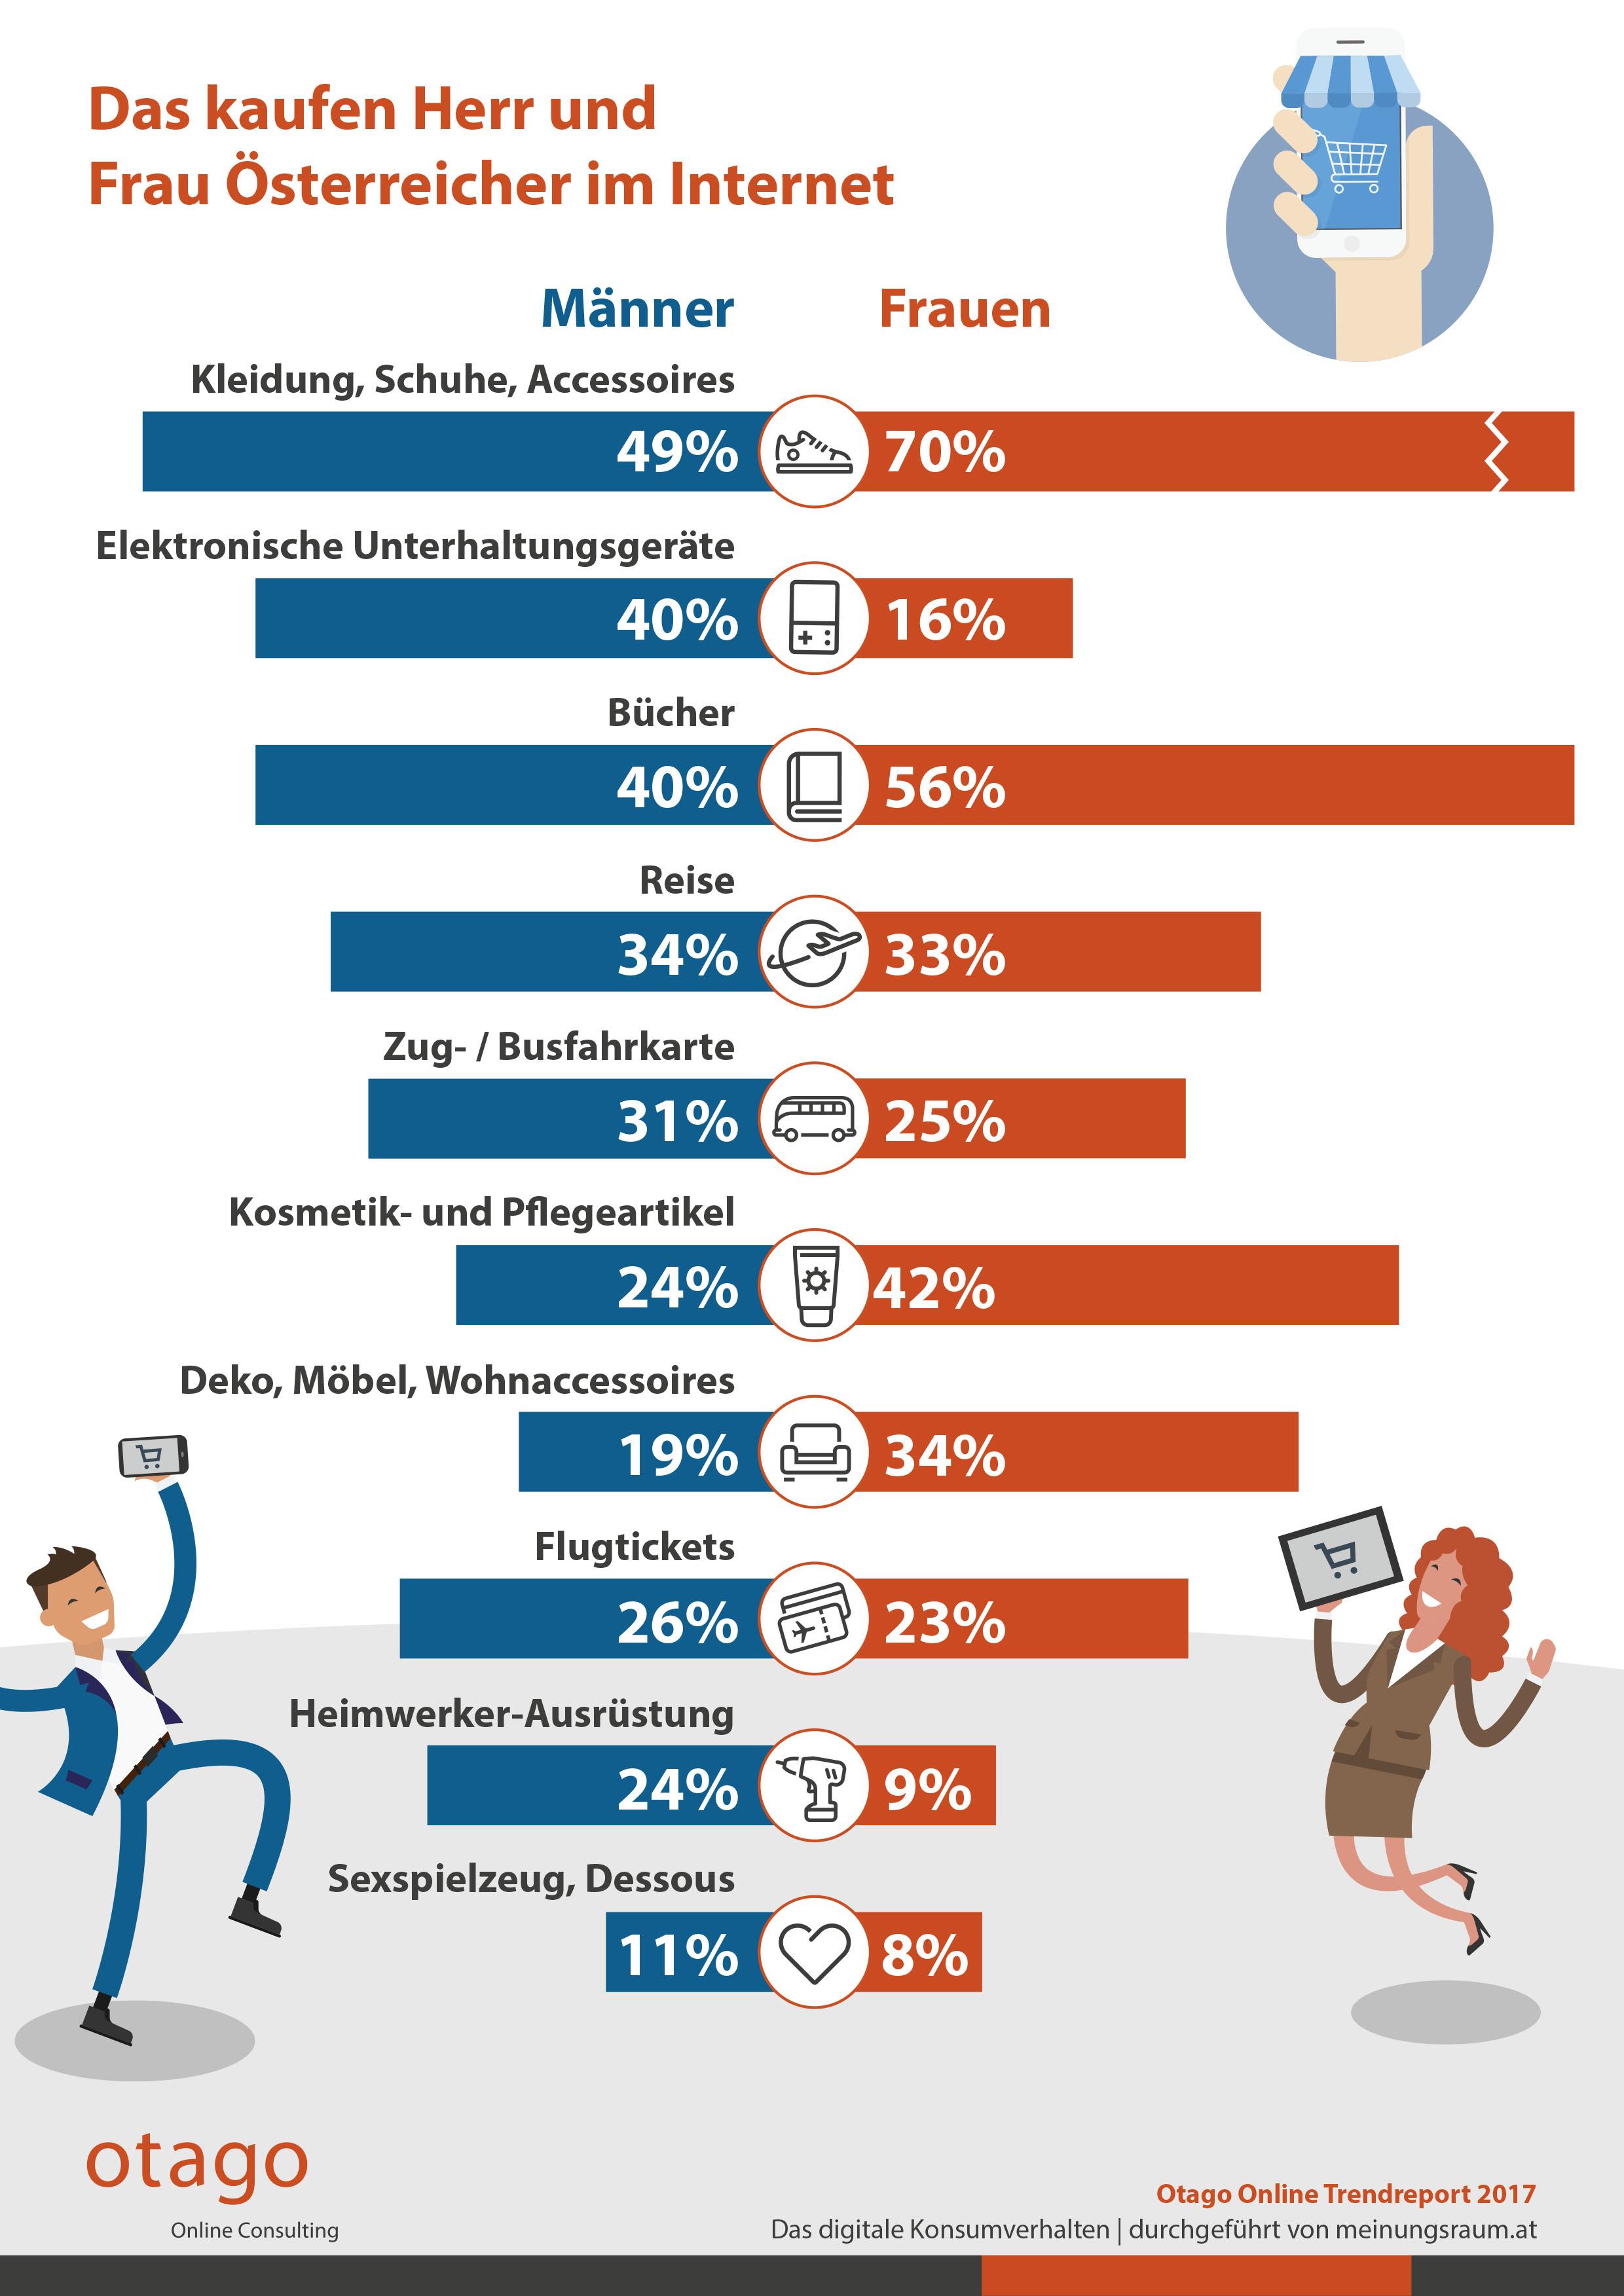 männer vs. frauen: der geschlechtervergleich beim online